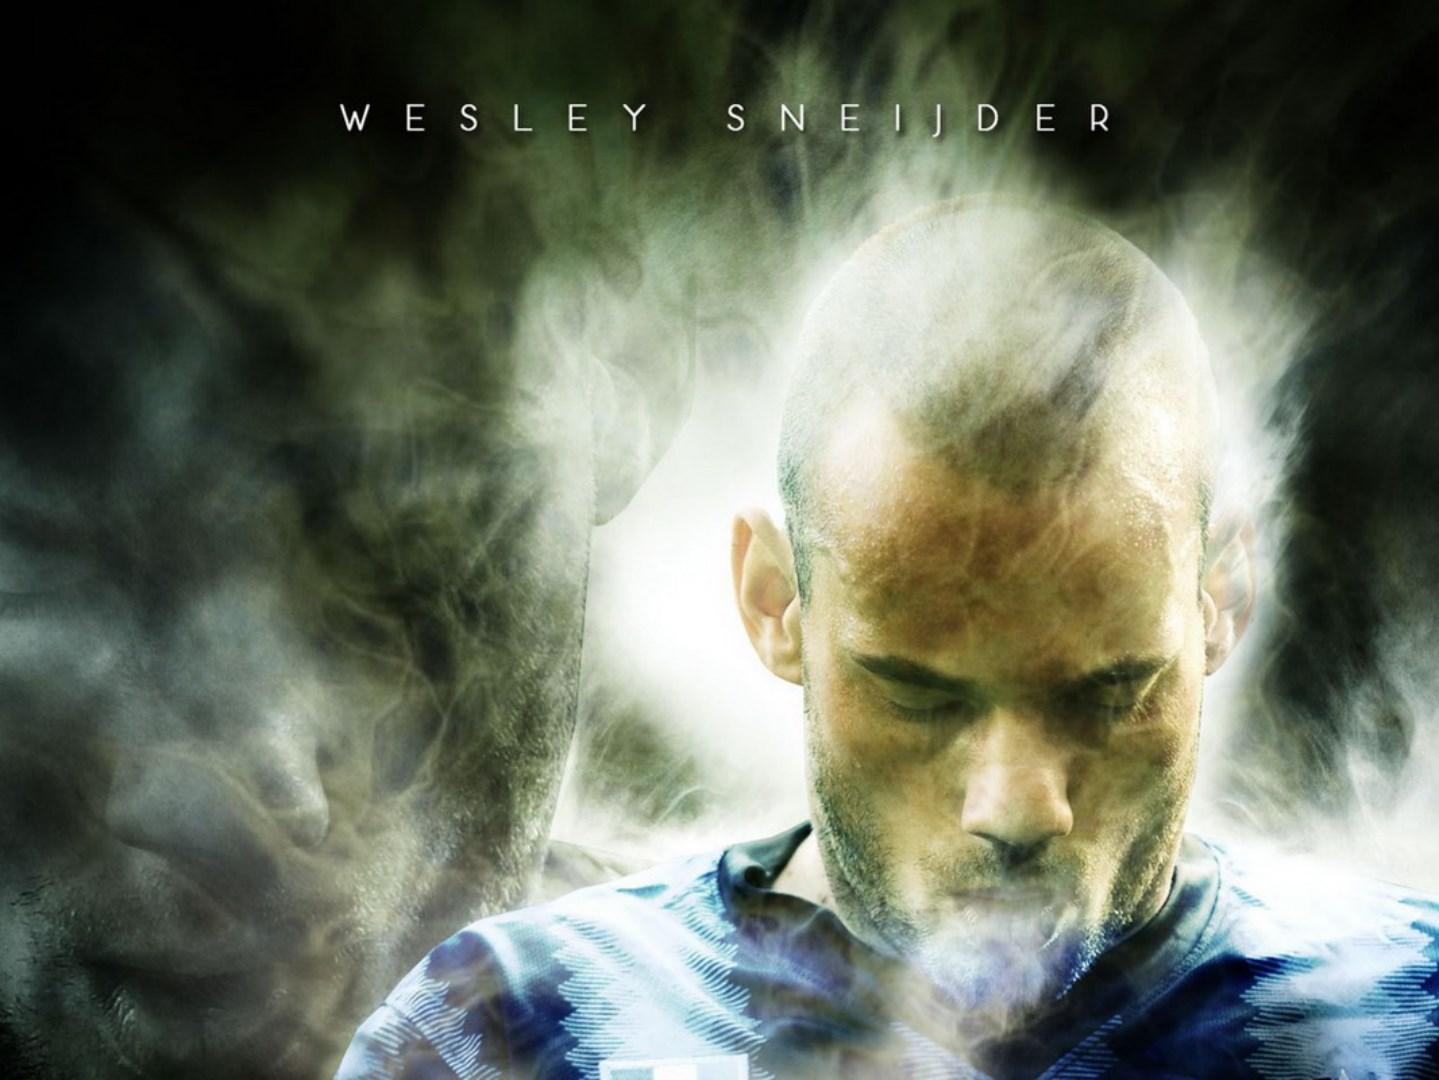 wesley+sneijder+galatasaray+resimleri+rooteto+20 Wesley Sneijder Galatasaray HD Resimleri